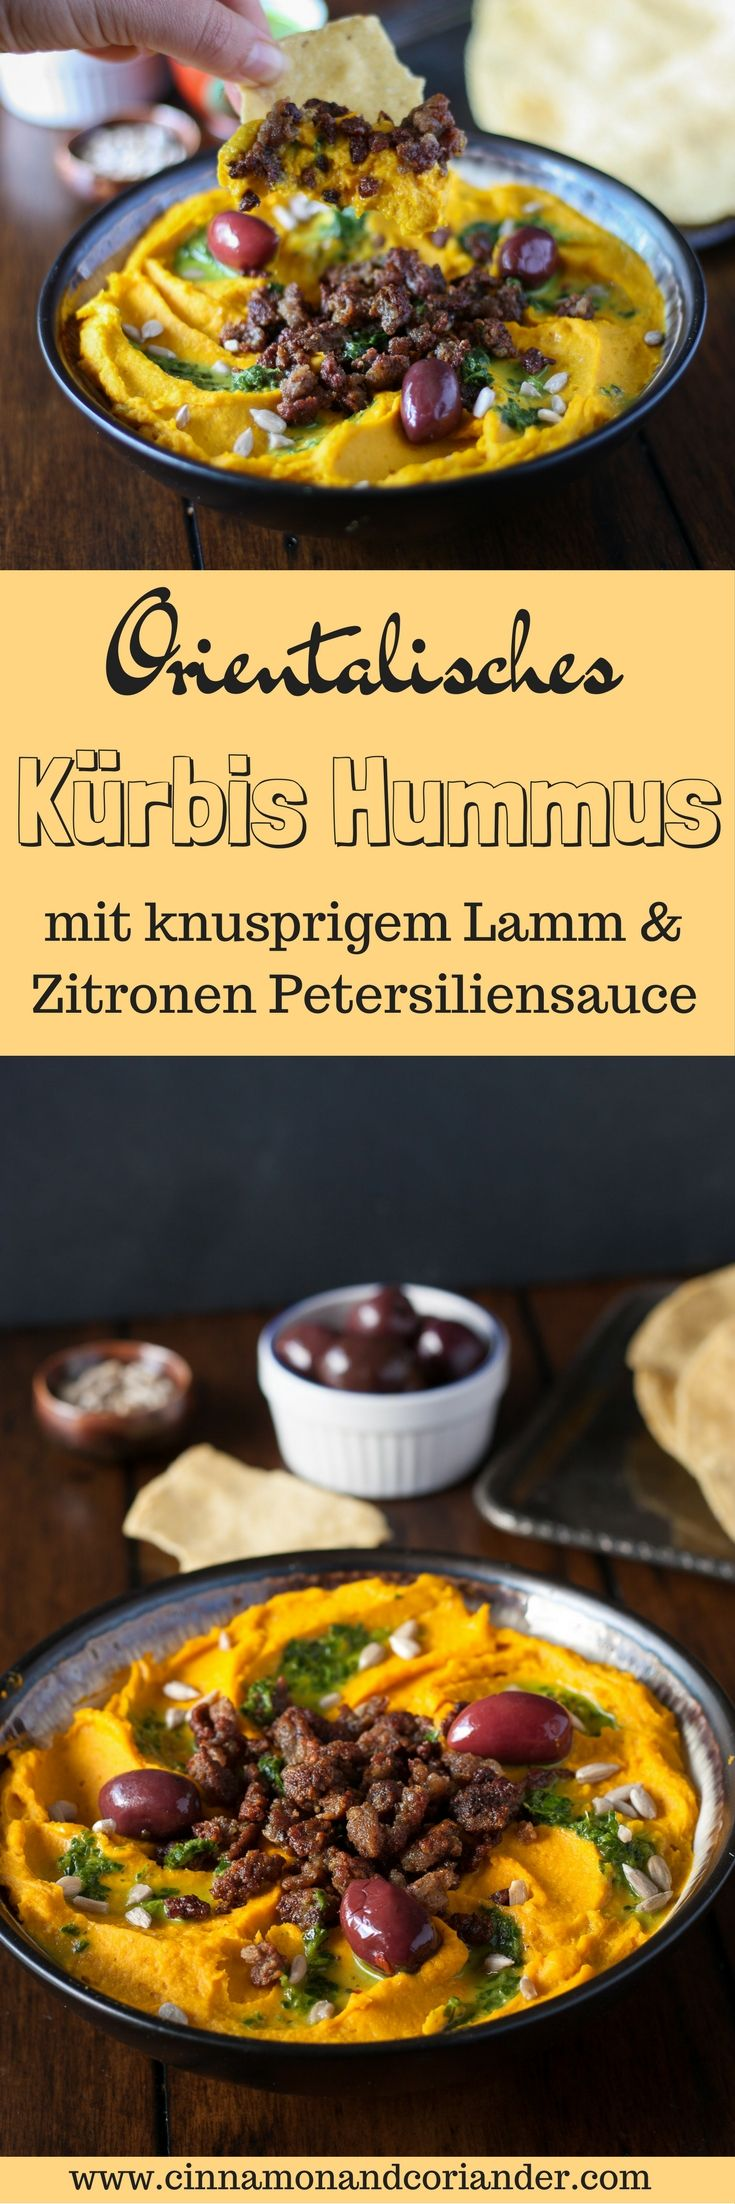 Kürbis Hummus mit knusprigem Lammhack und Zitronen Petersiliensauce